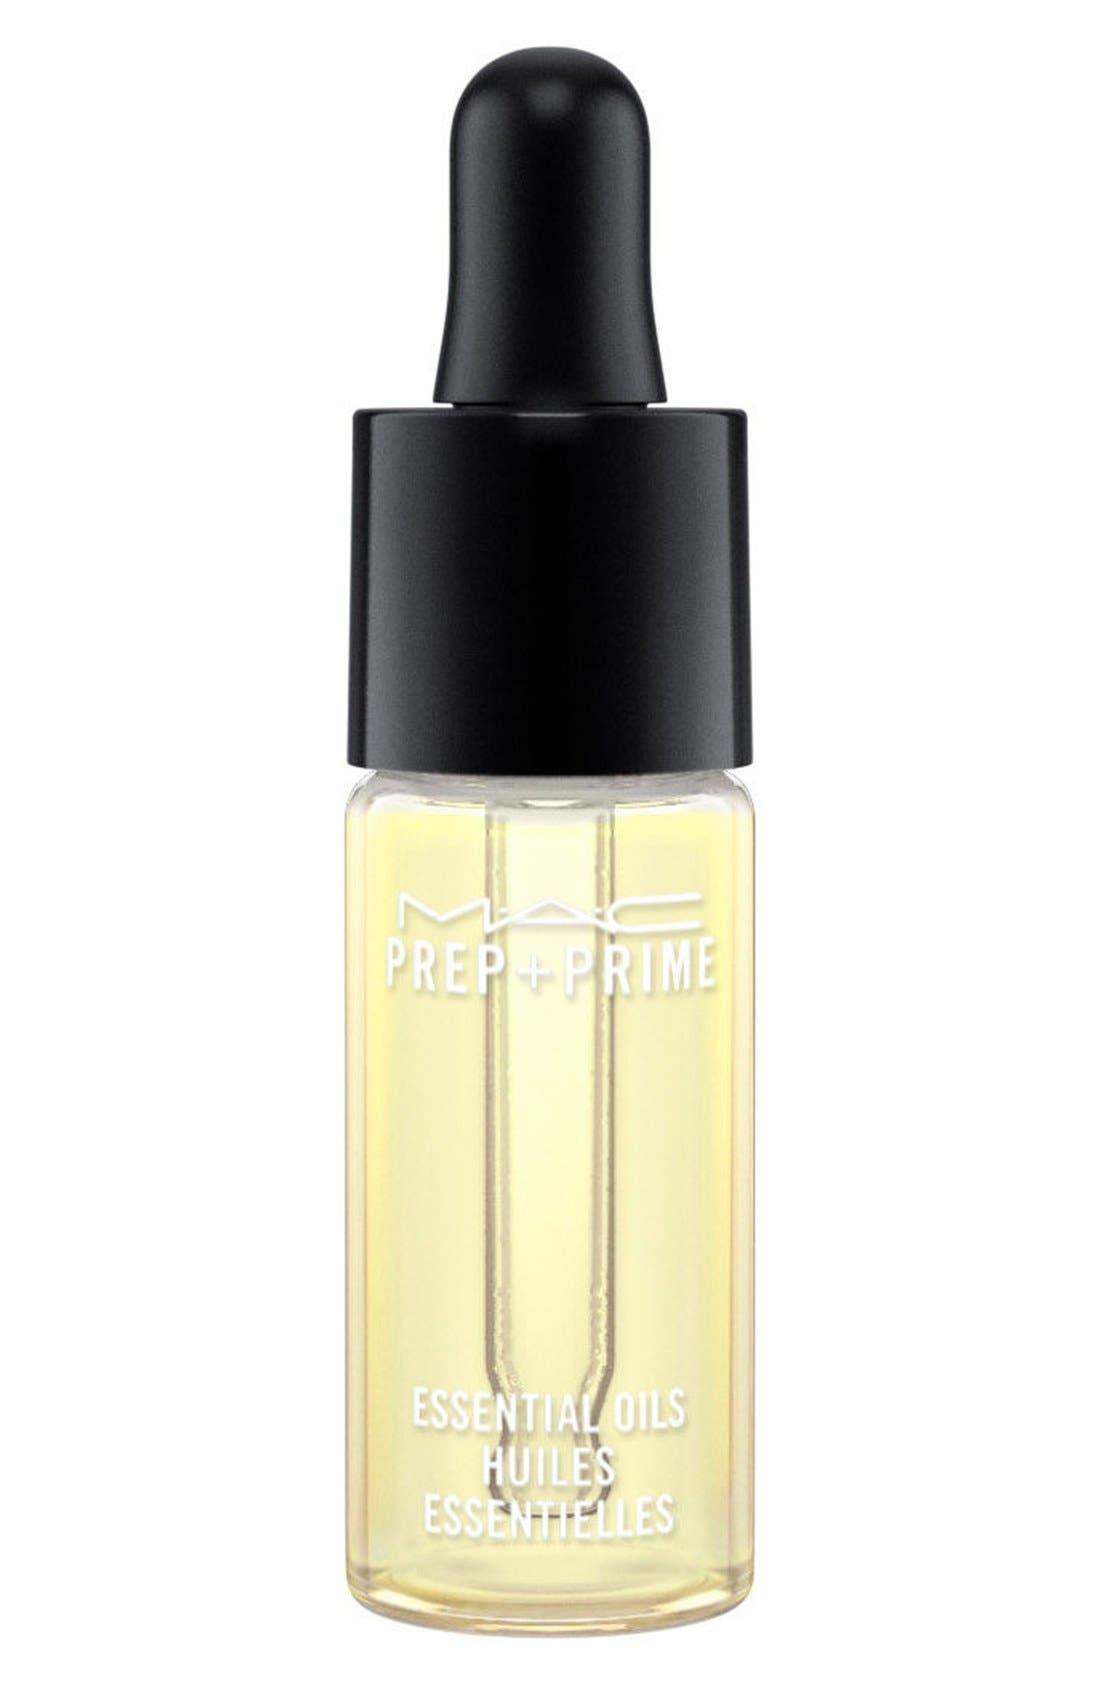 MAC Prep + Prime Grapefruit & Chamomile Essential Oils,                             Main thumbnail 1, color,                             GRAPEFRUIT/ CHAMOMILE